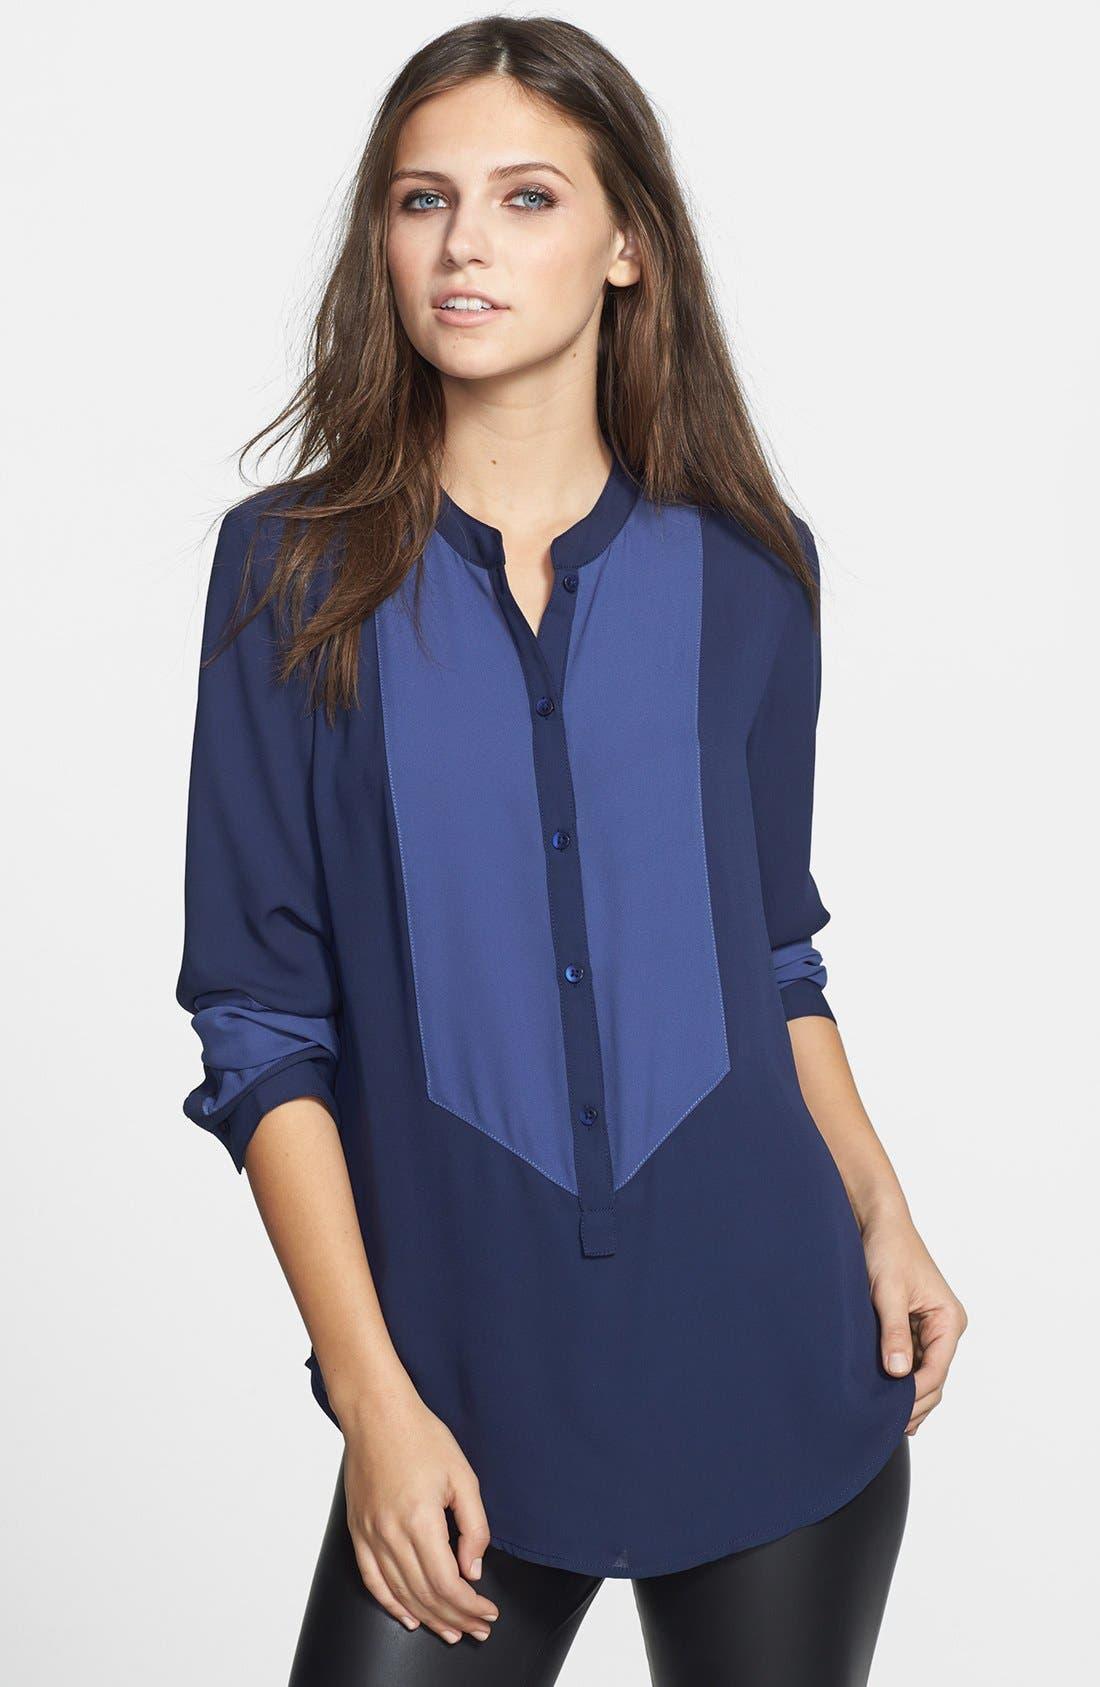 Alternate Image 1 Selected - Leith Colorblock Chiffon Shirt